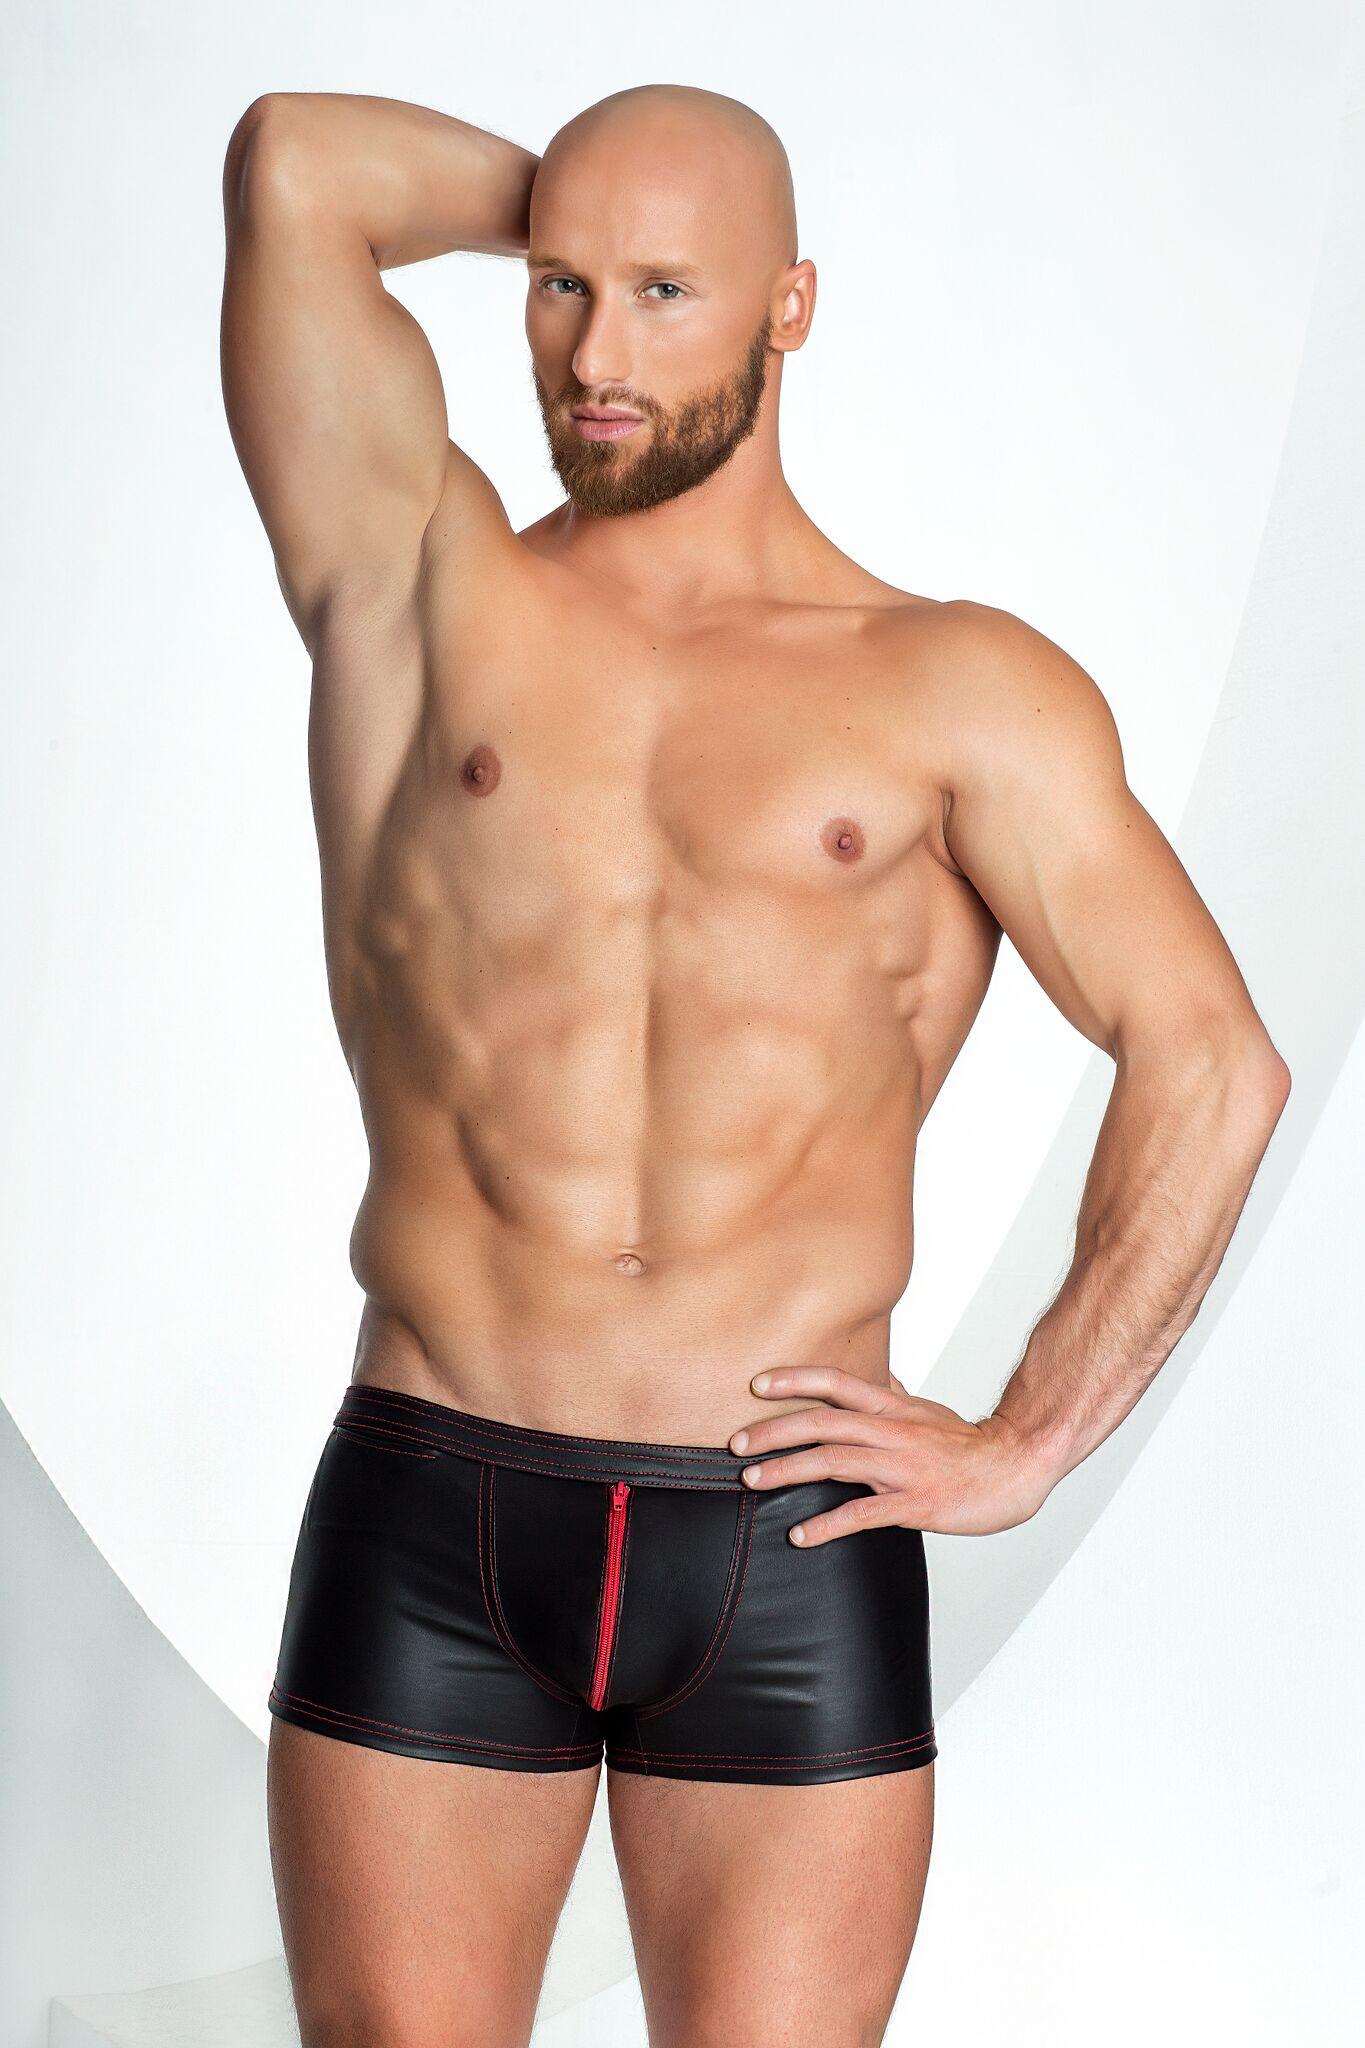 sexy undertøy for store damer homse sex